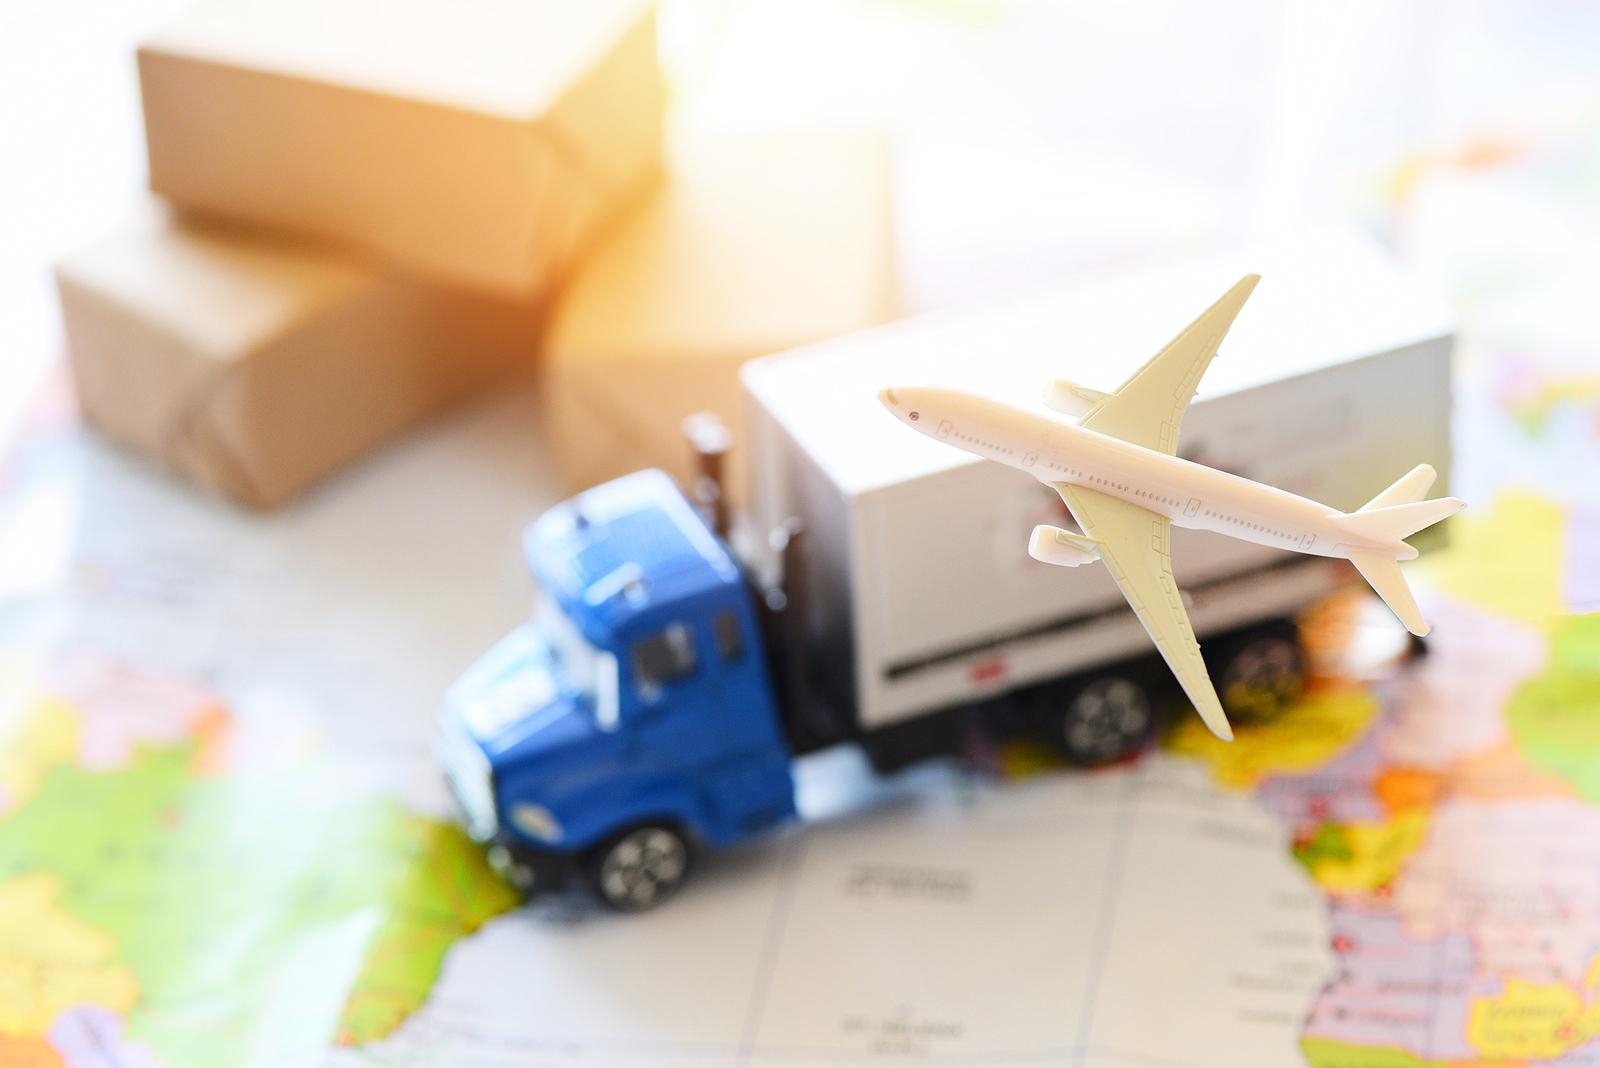 Top 5 Tips for Shipping Art Internationally